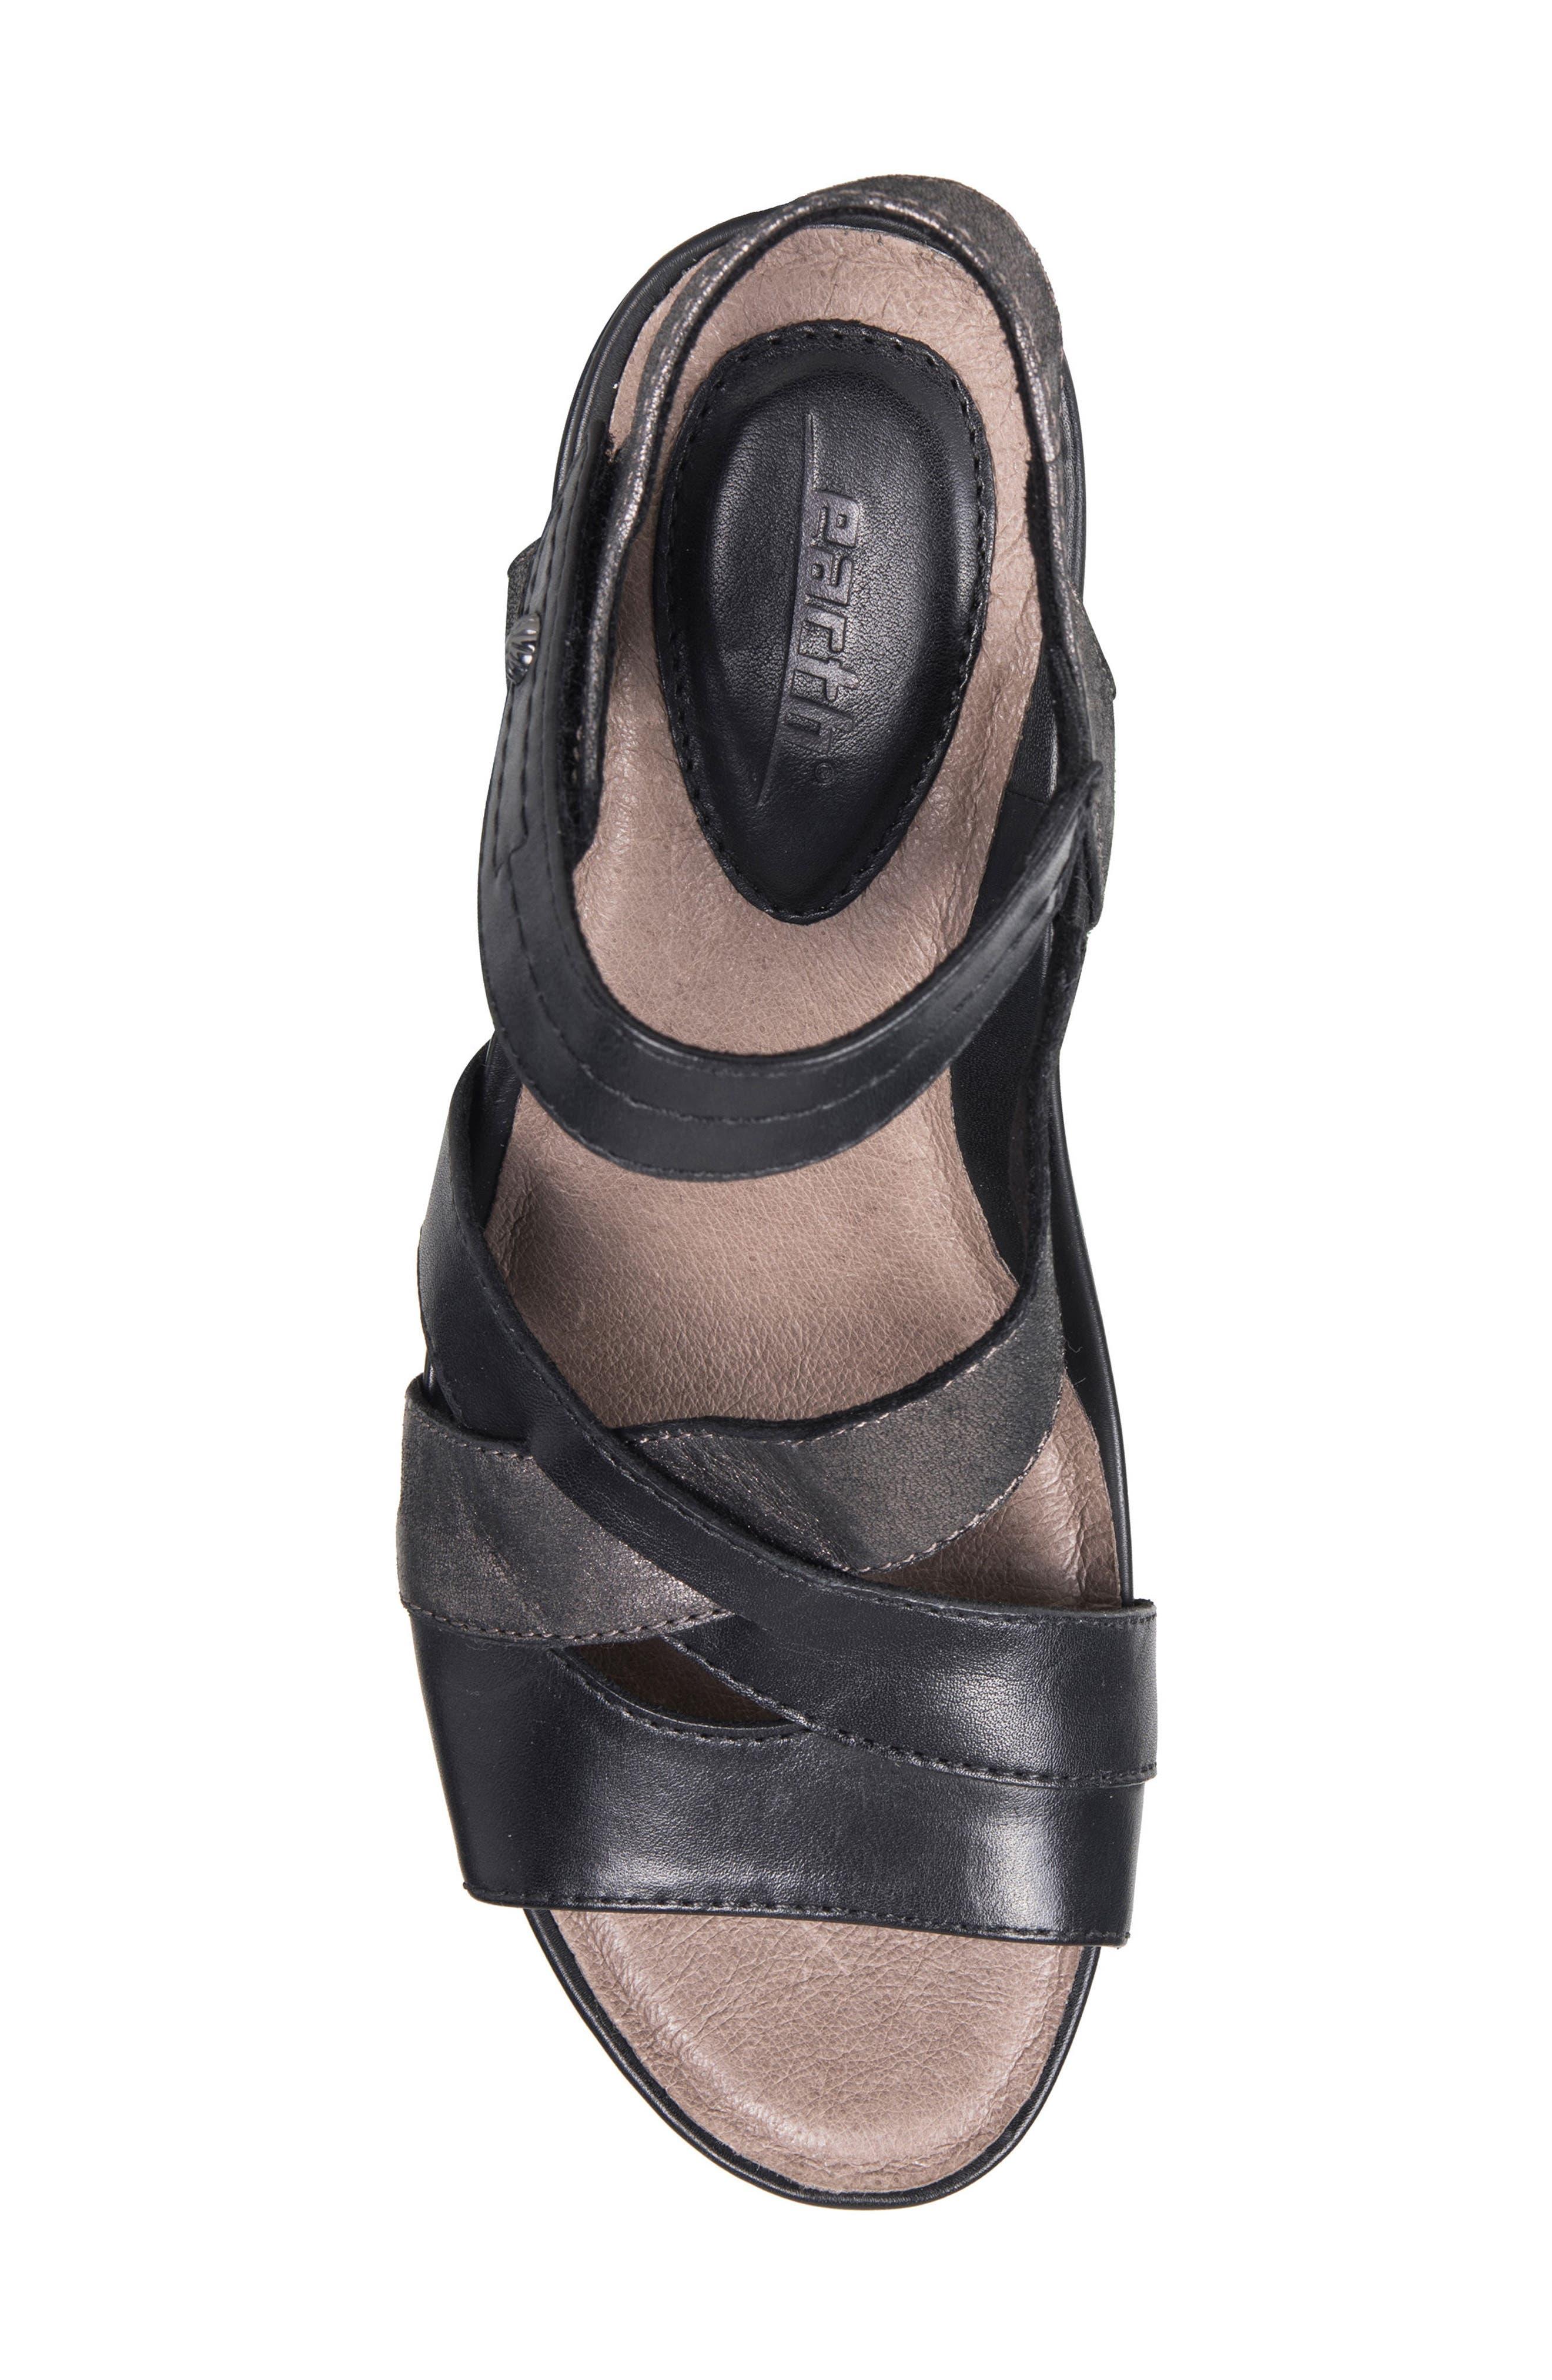 Thistle Wedge Sandal,                             Alternate thumbnail 4, color,                             001